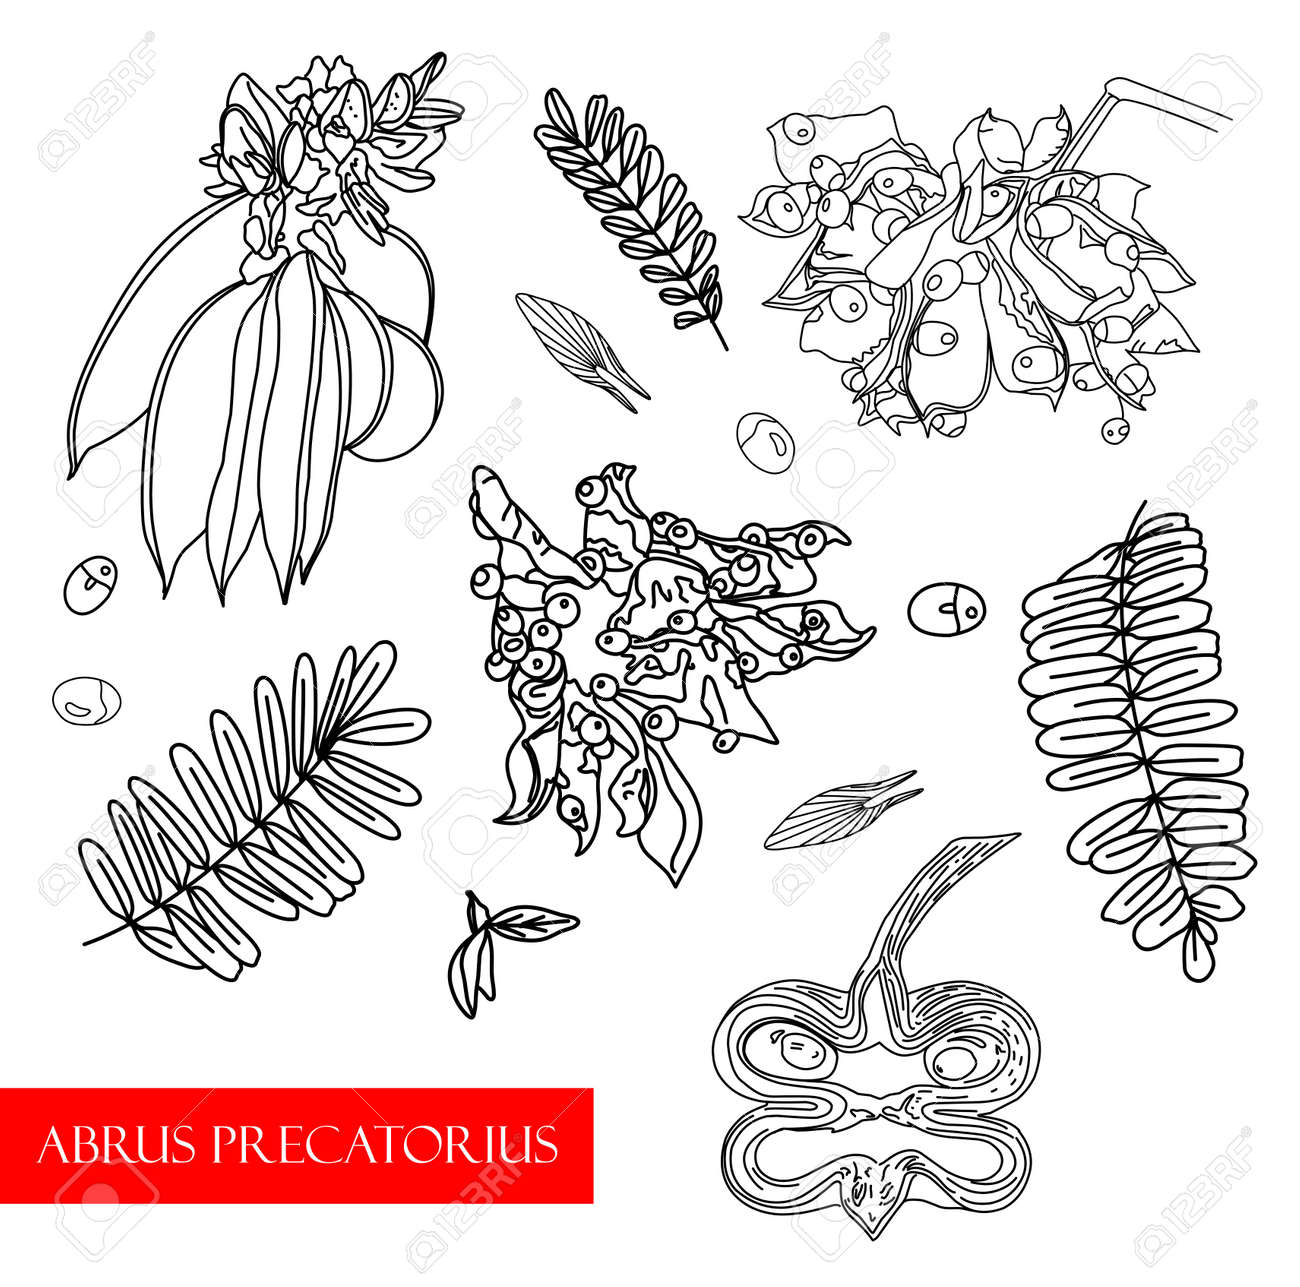 Treatment plant. Ethnoscience Vector illustration - 168196980